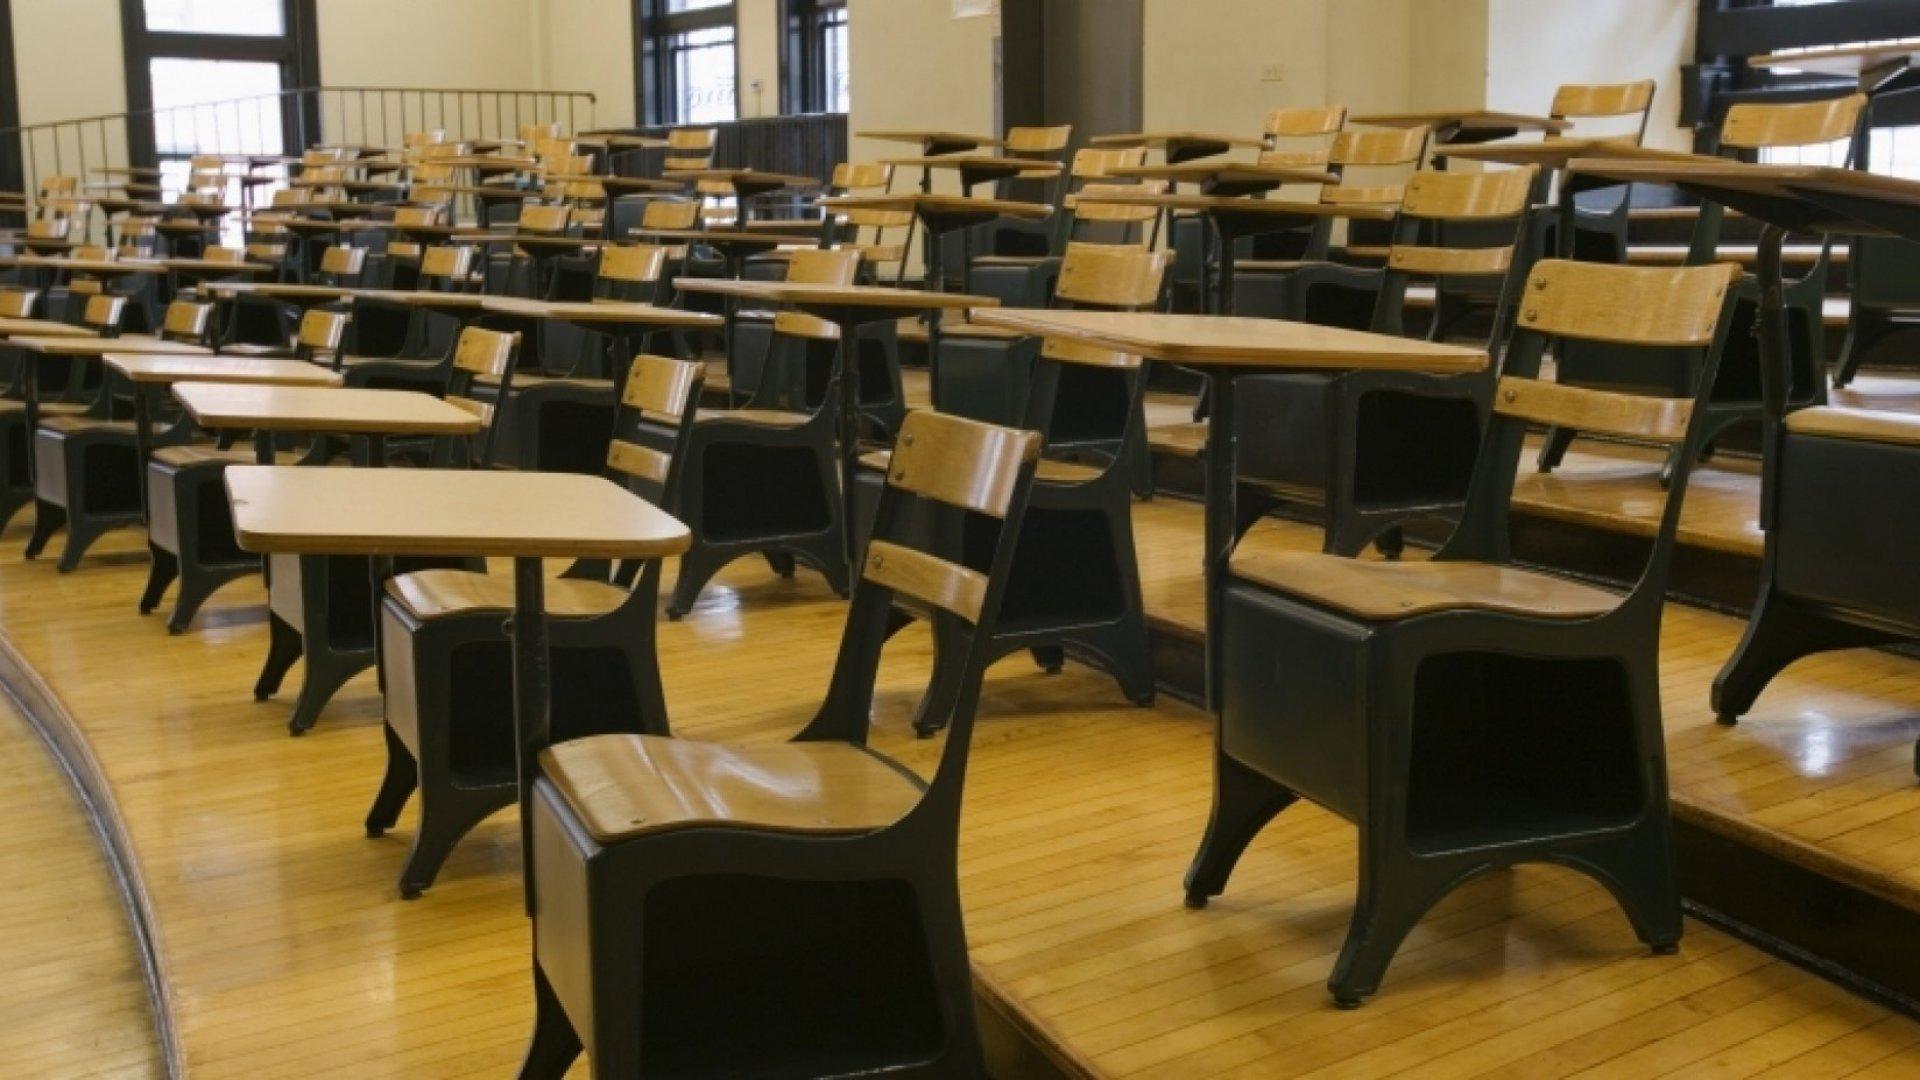 3 Reasons Graduate School Could Ruin Your Career